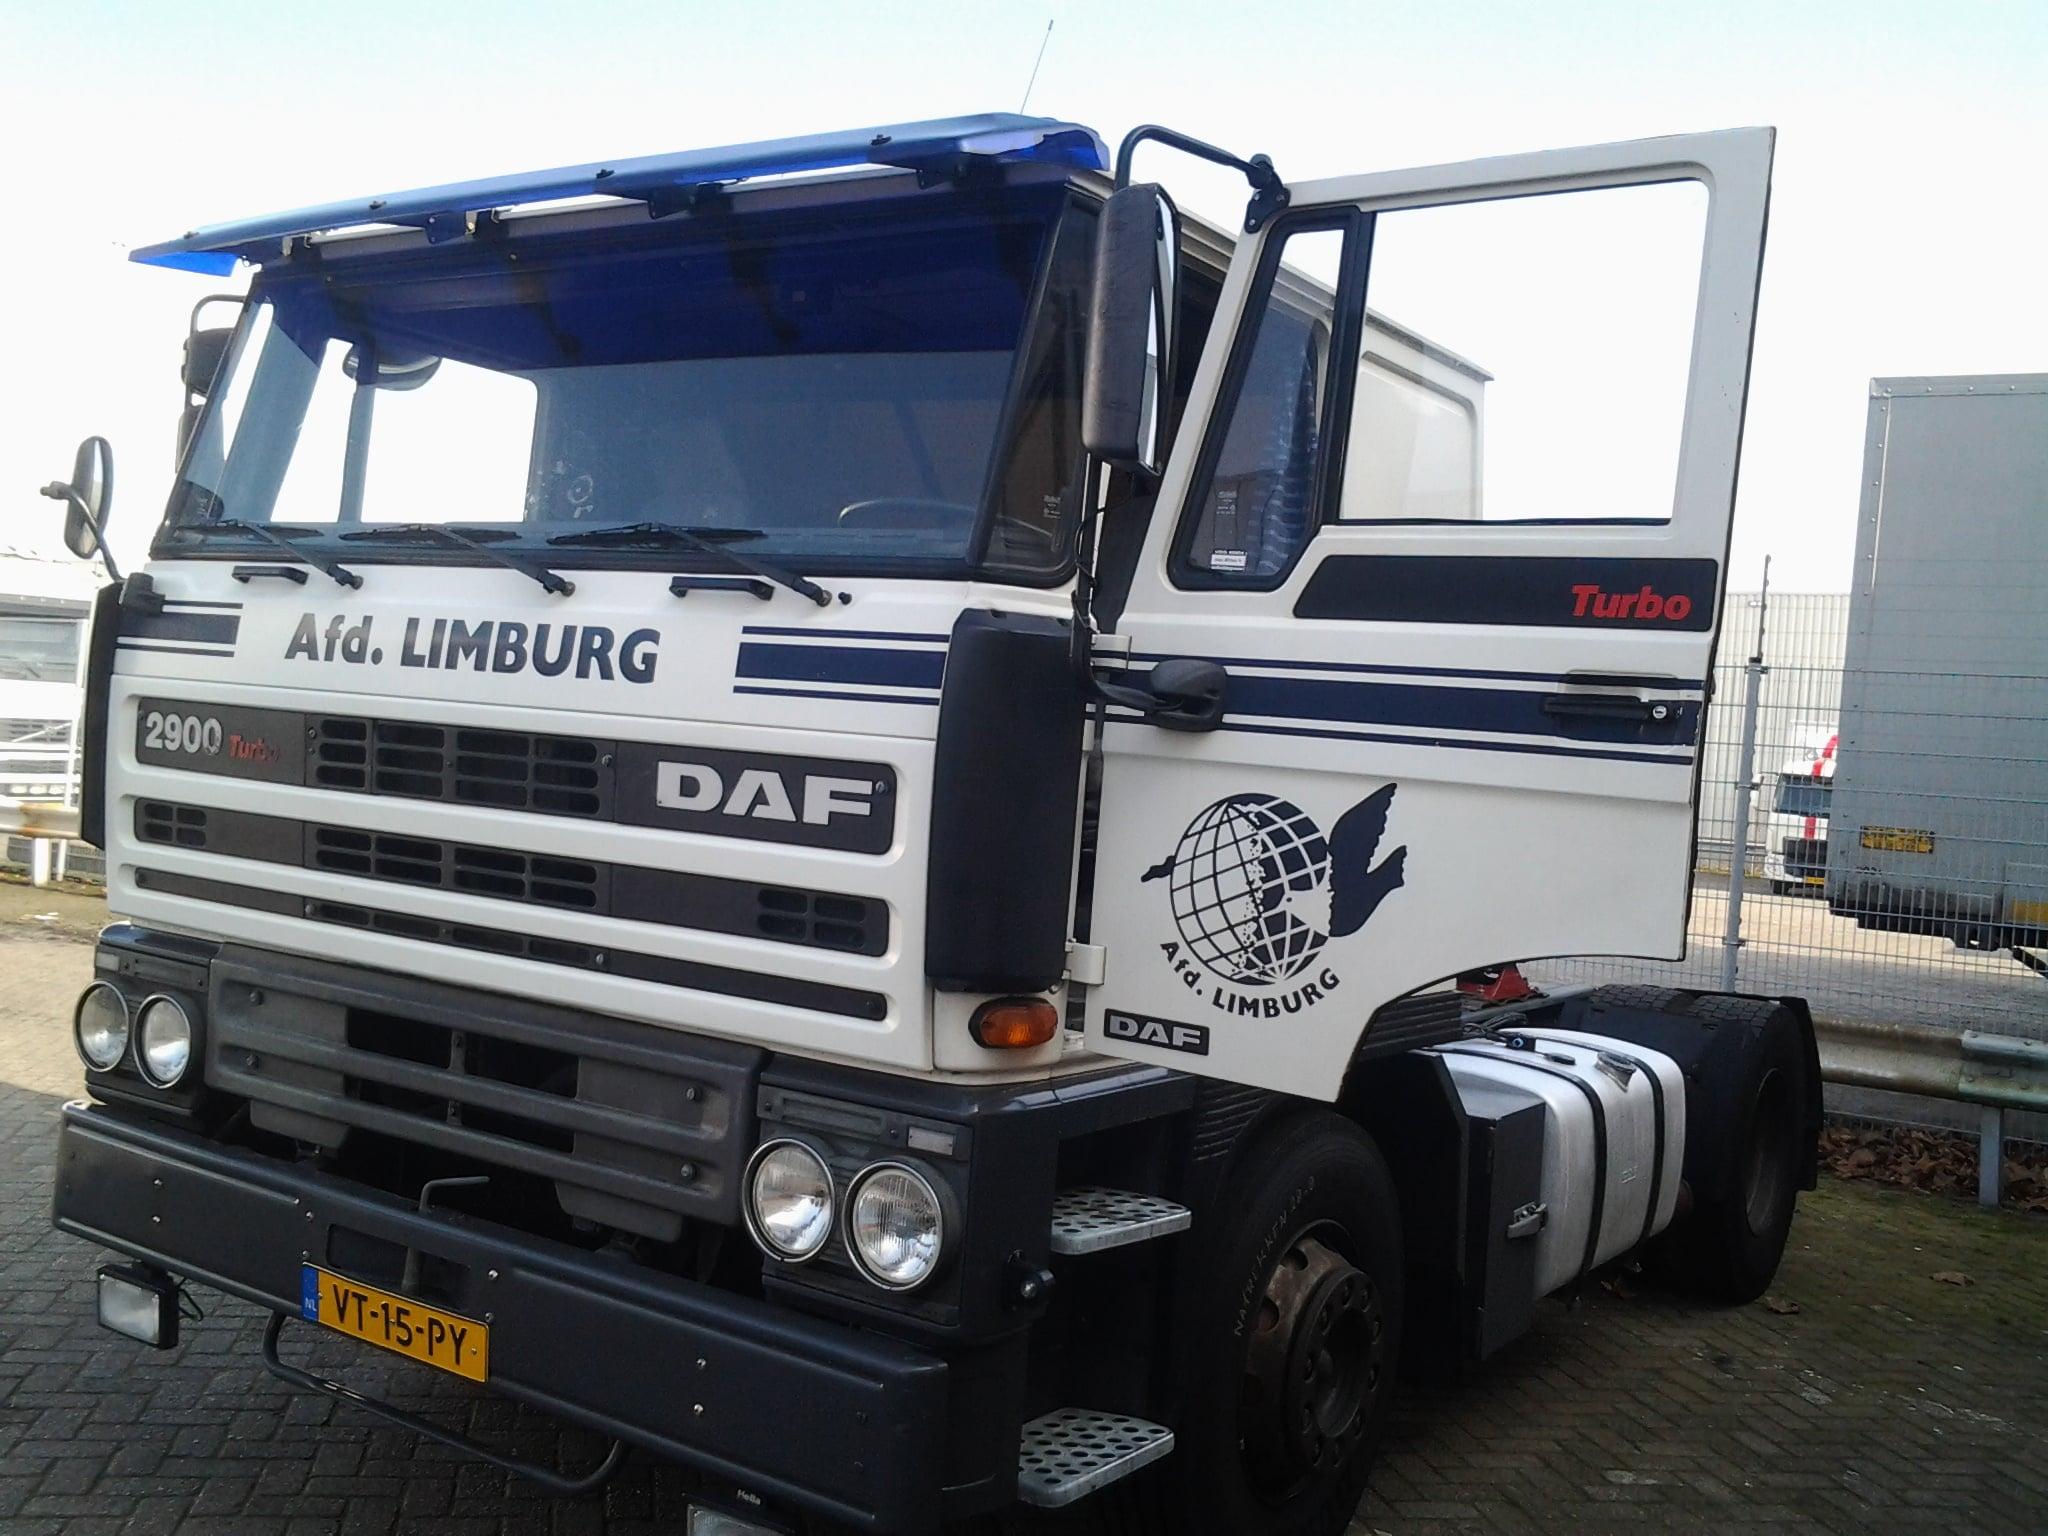 DAF-2900-duiven-wagen